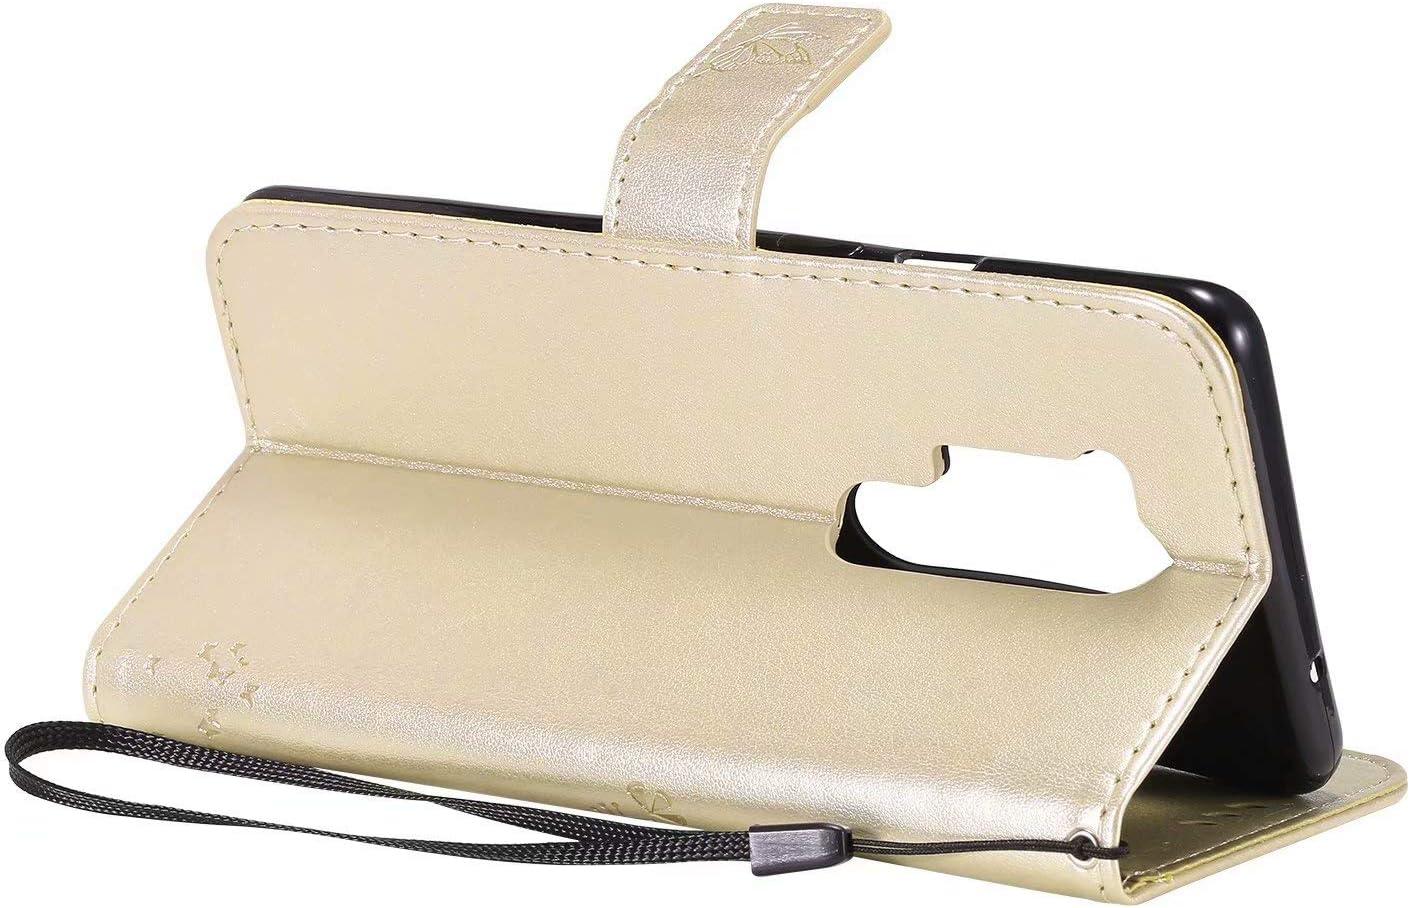 HUIZHIHUA Funda Compatibles para OnePlus 8 Pro Carcasa Caja Anti-Shock protecci/ón de c/áscara TPU Silicona+PC Transparente Cover Mate Case-Azul